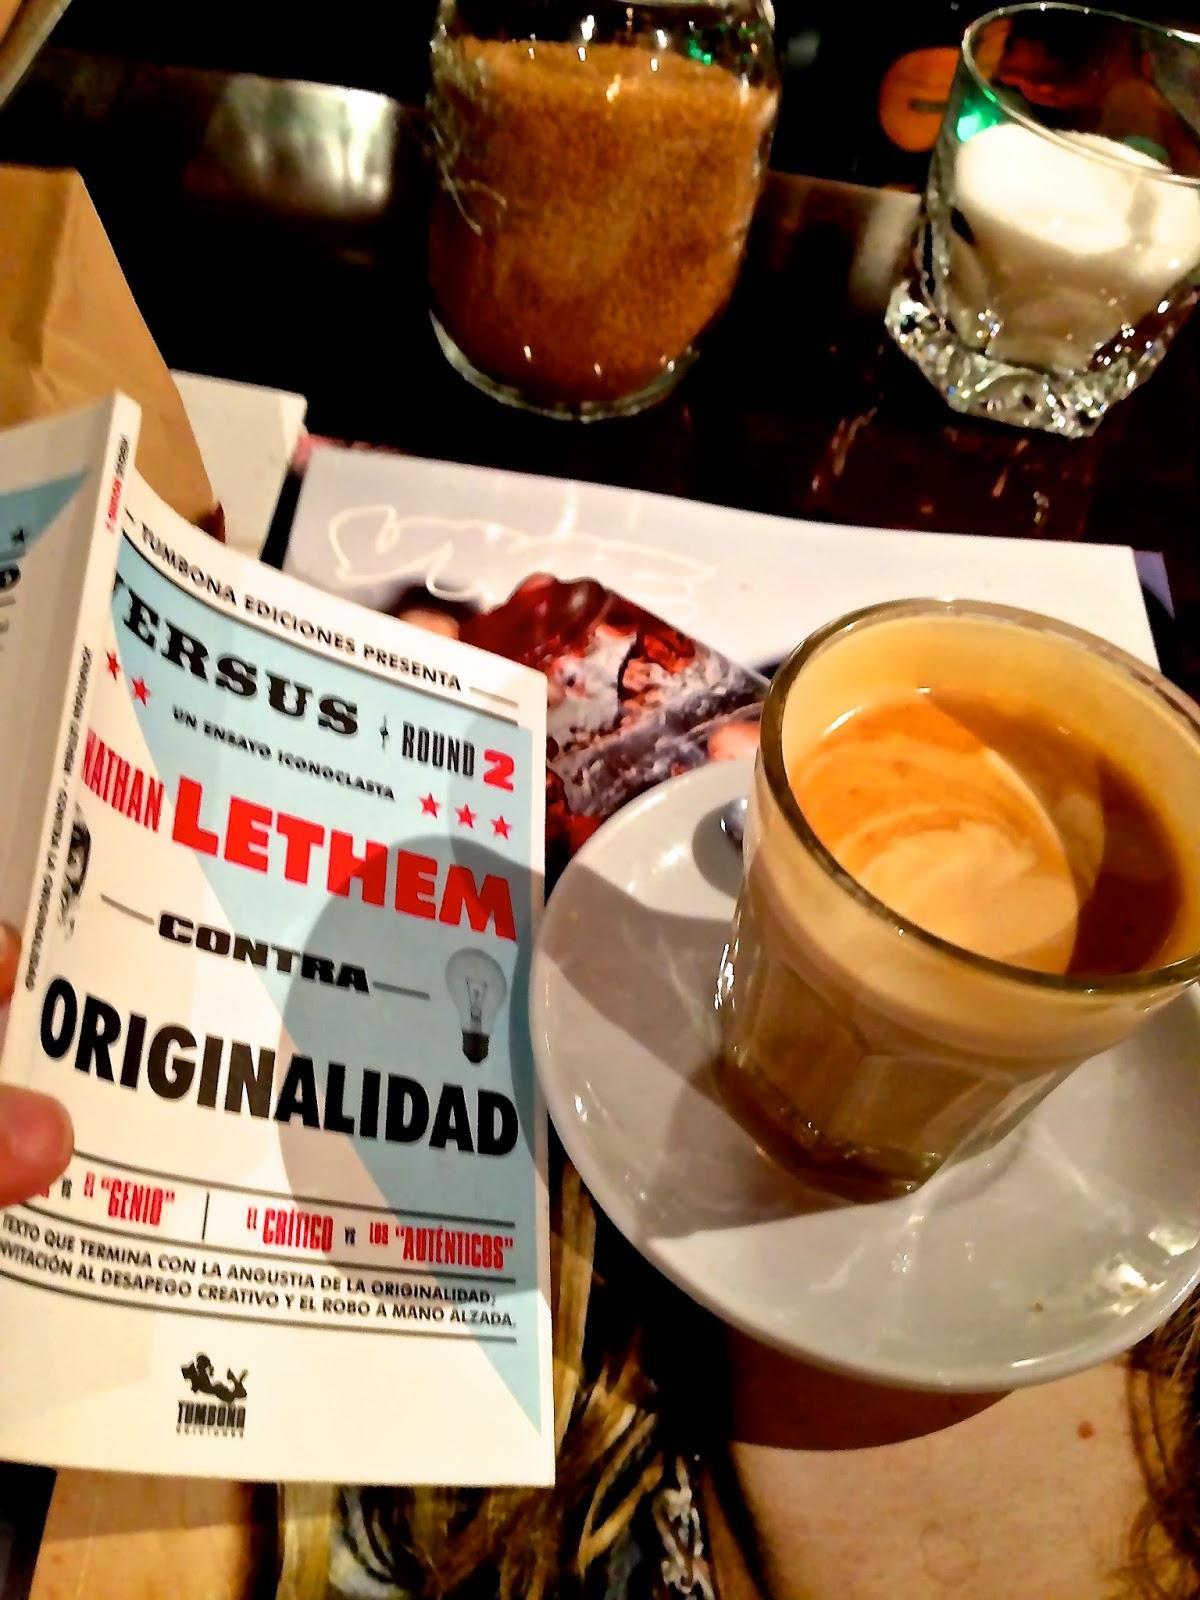 Jonathan Lethem Originalidad